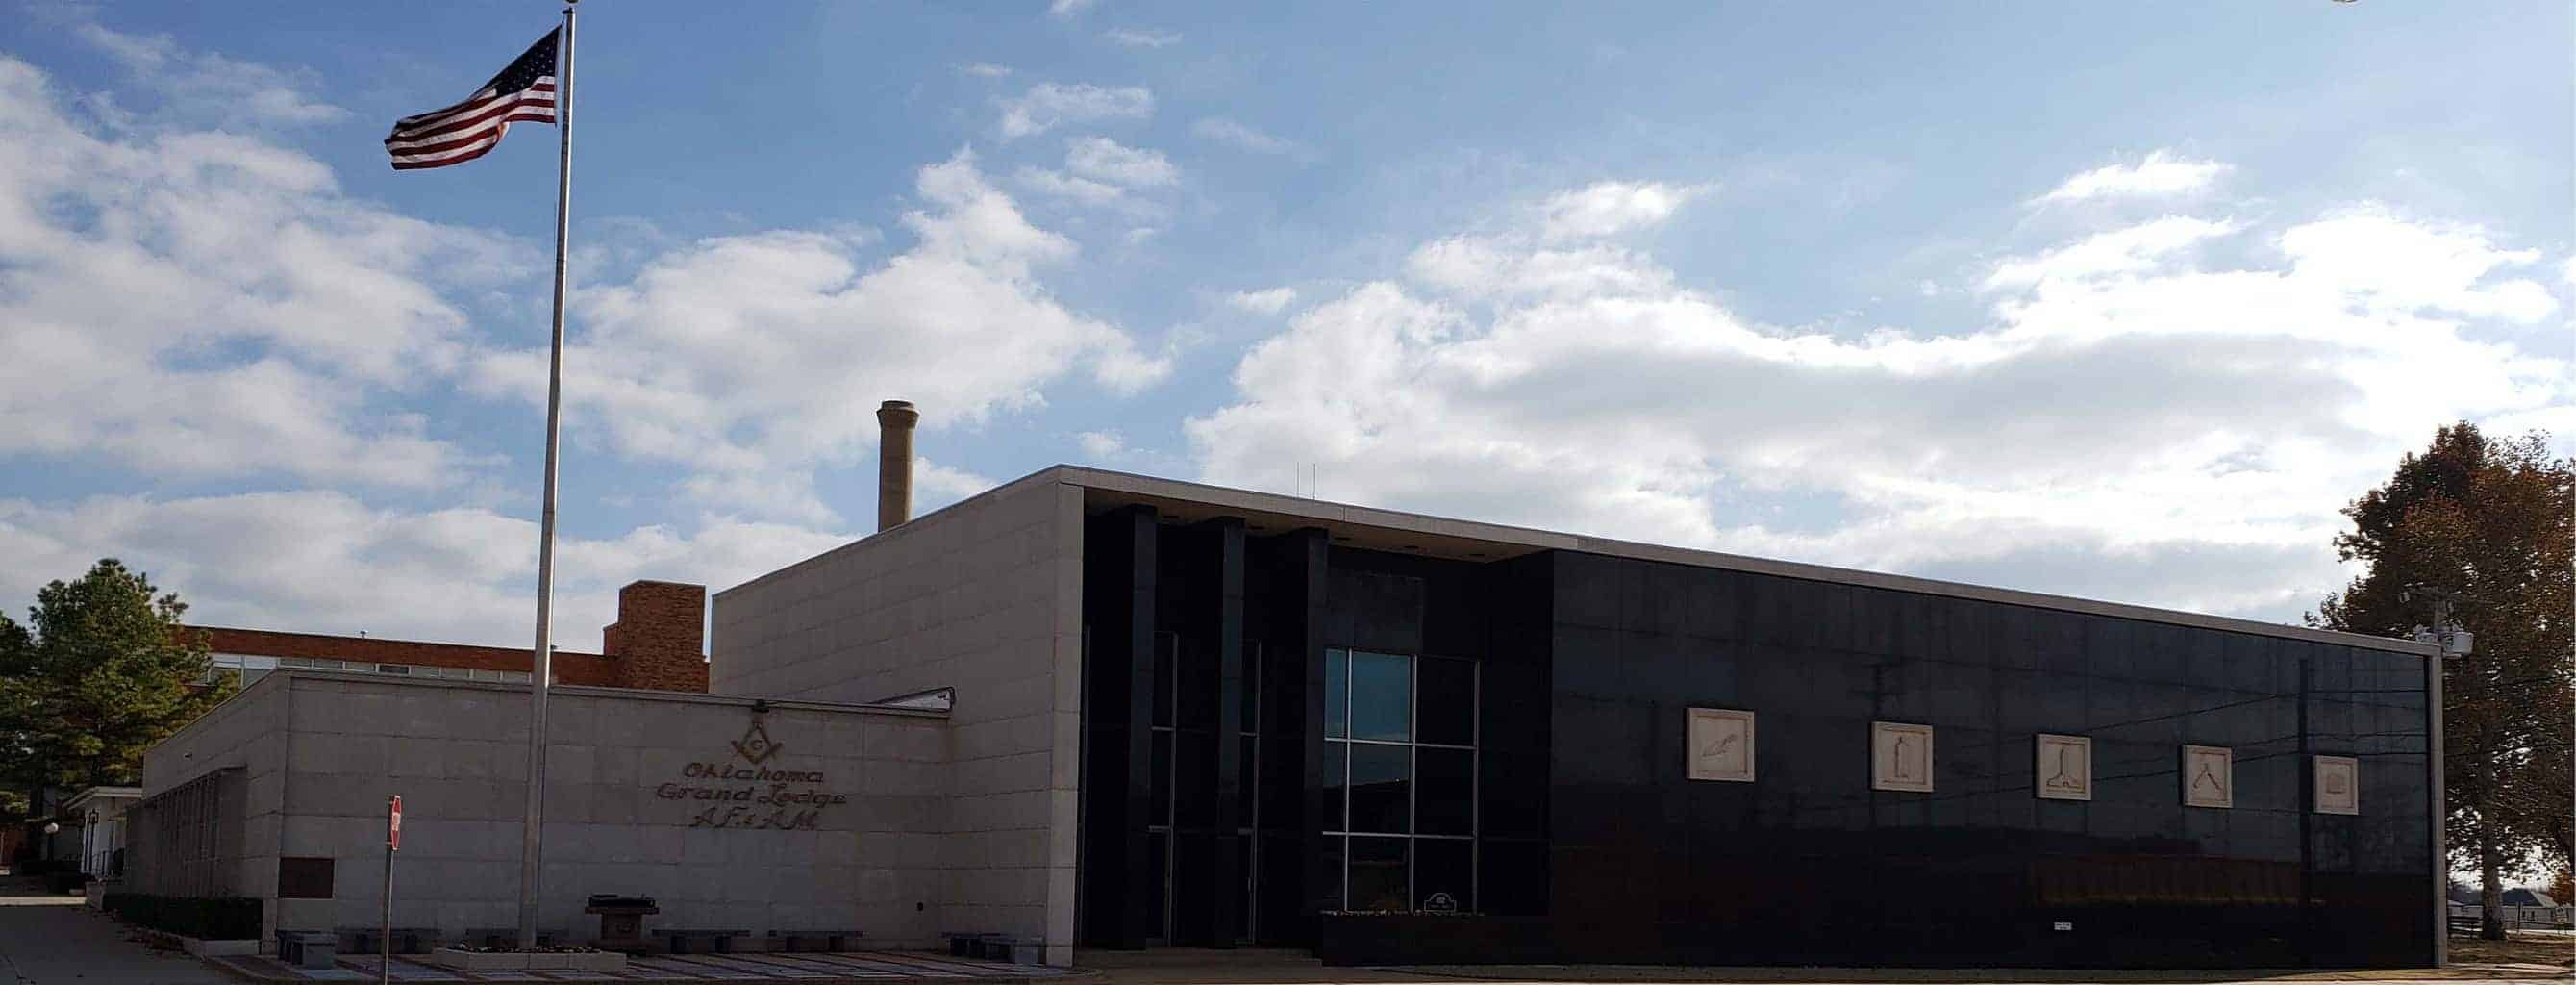 The Grand Lodge of Oklahoma A.F.&A.M.